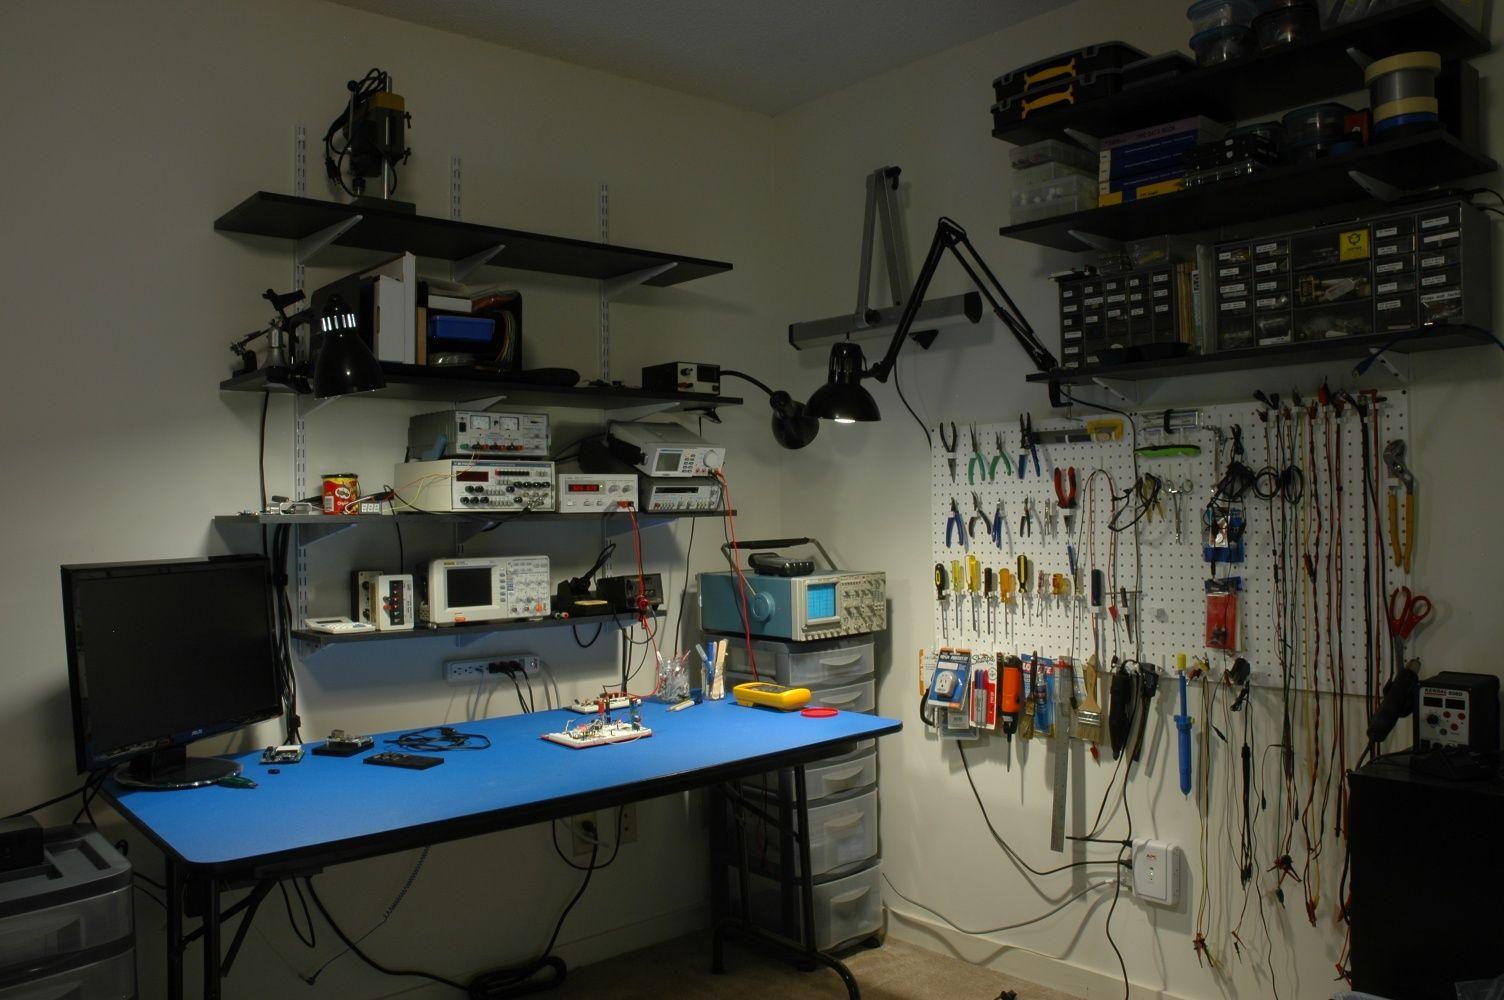 Www Applesnotoranges Com Cheap Imac Pc Repair Computer Repair Workbench Computer Shop